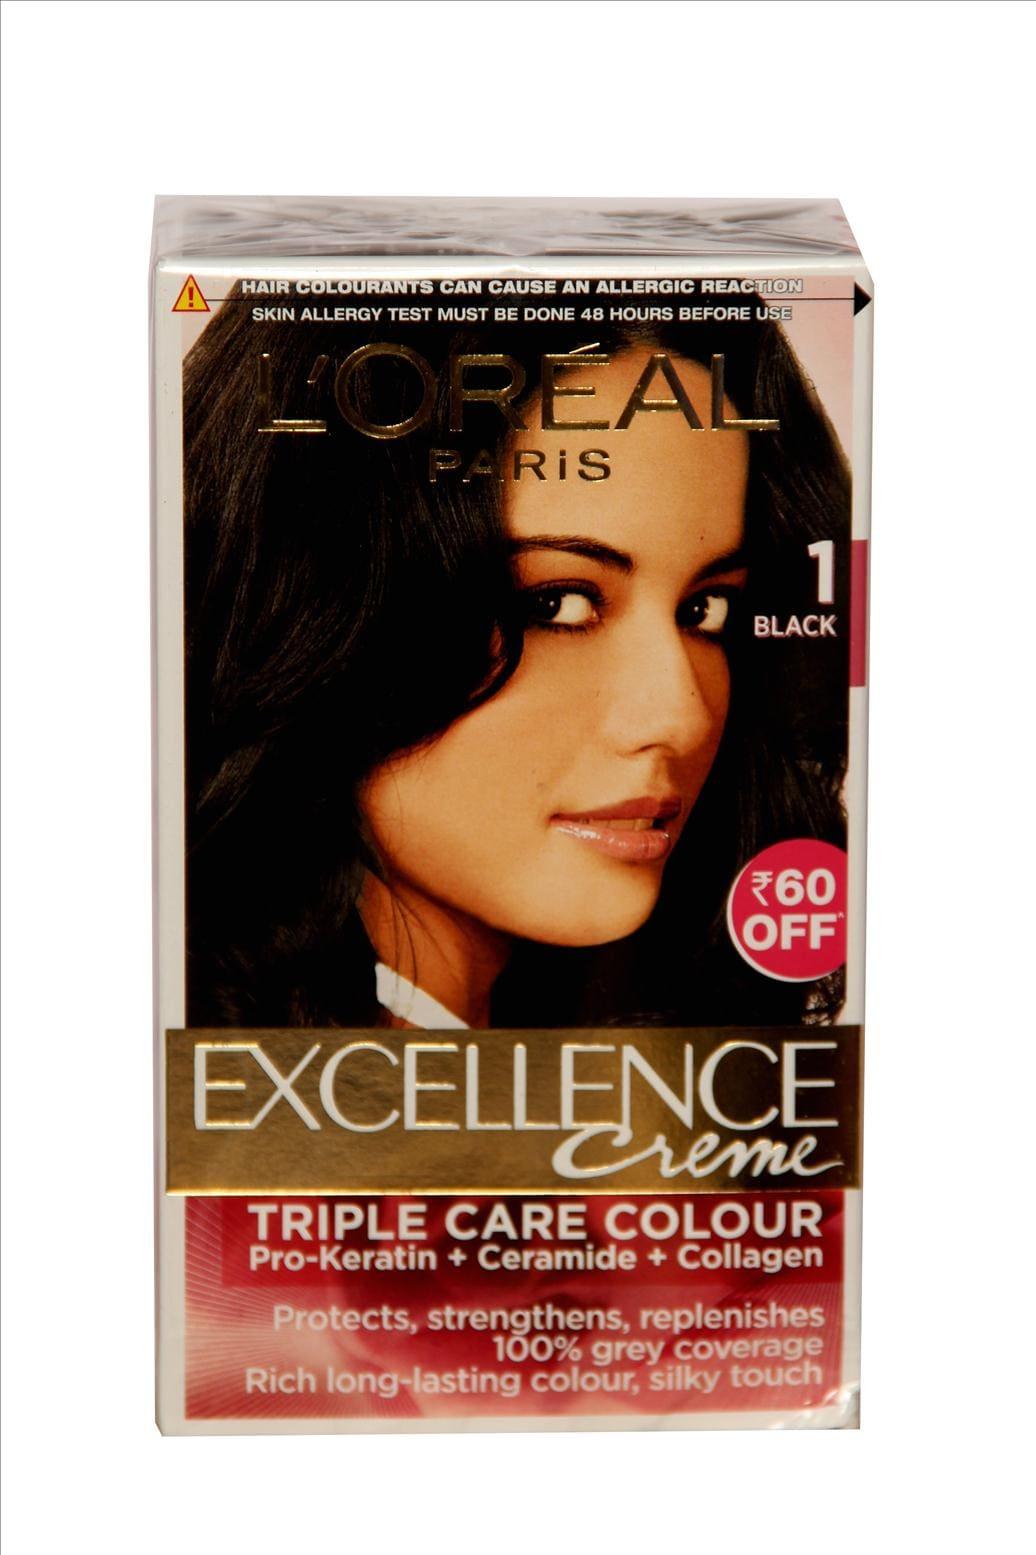 L'Oreal Paris No.1 Black Hair Colour Cream